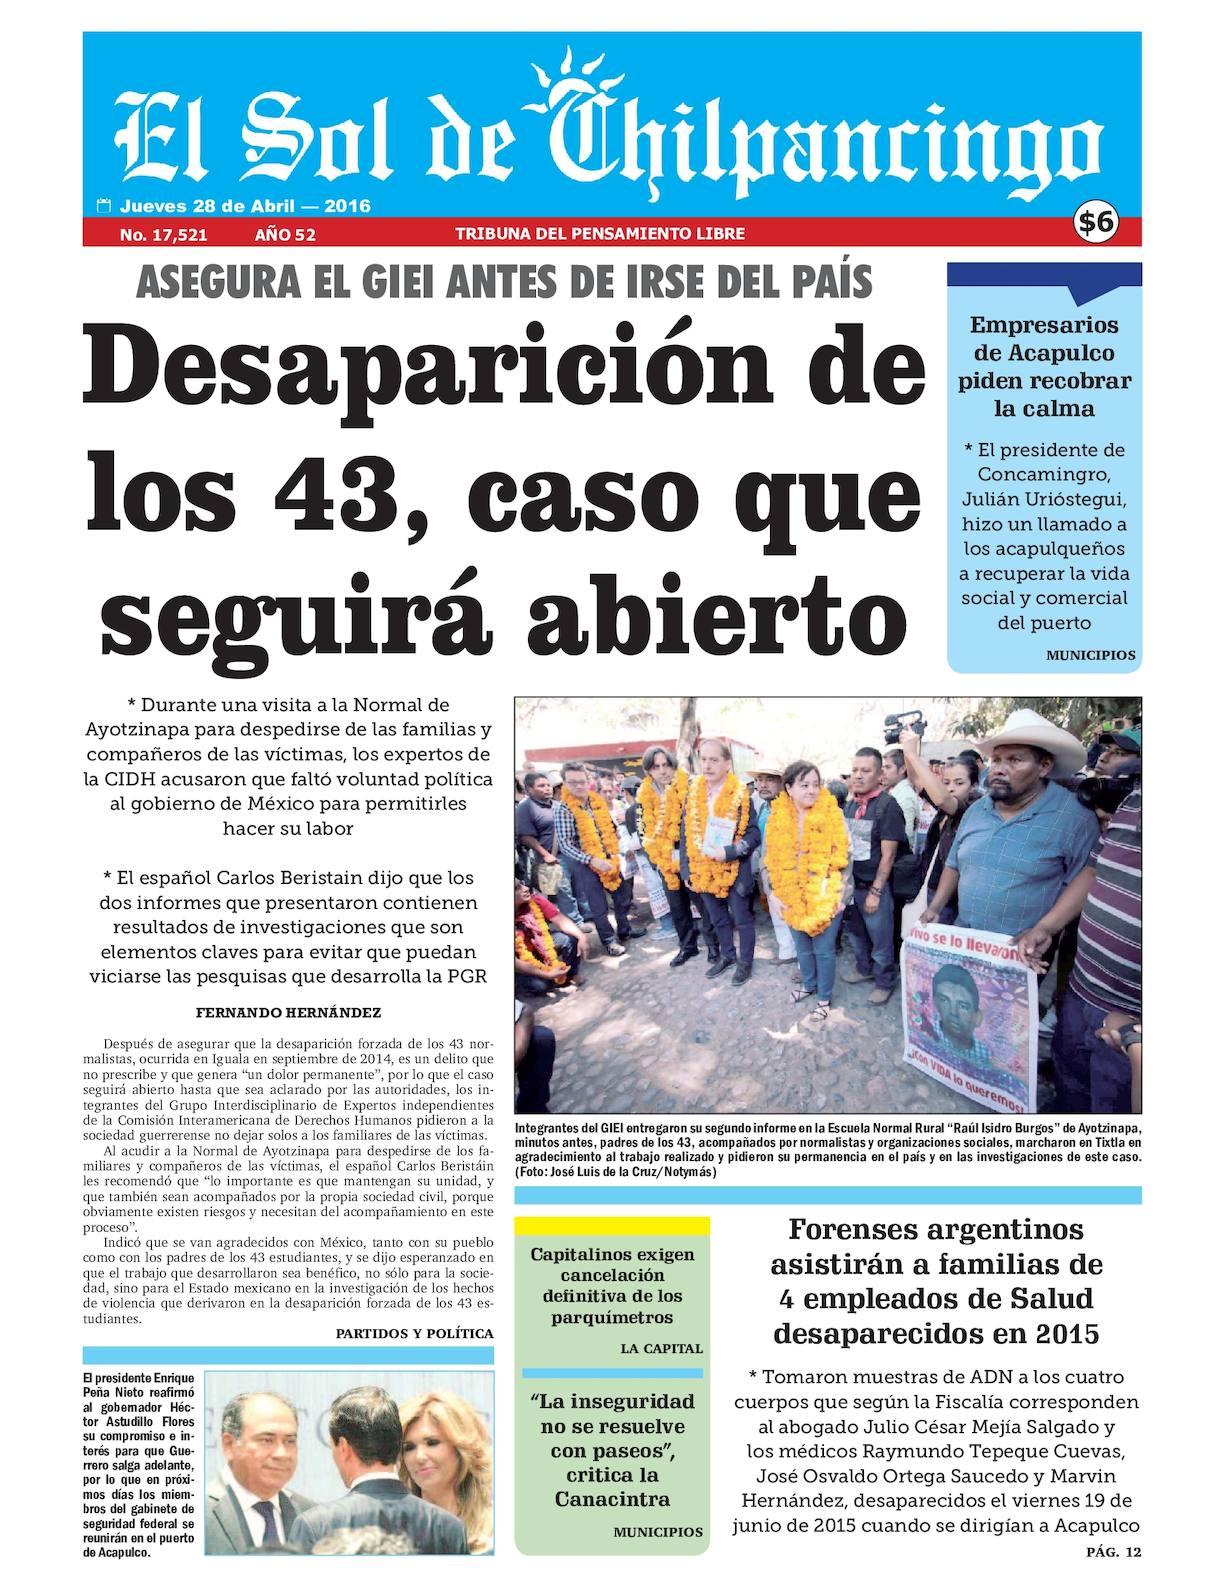 Calaméo - El Sol De Chilpancingo 28 Abril 2016 9ad6a48169b12